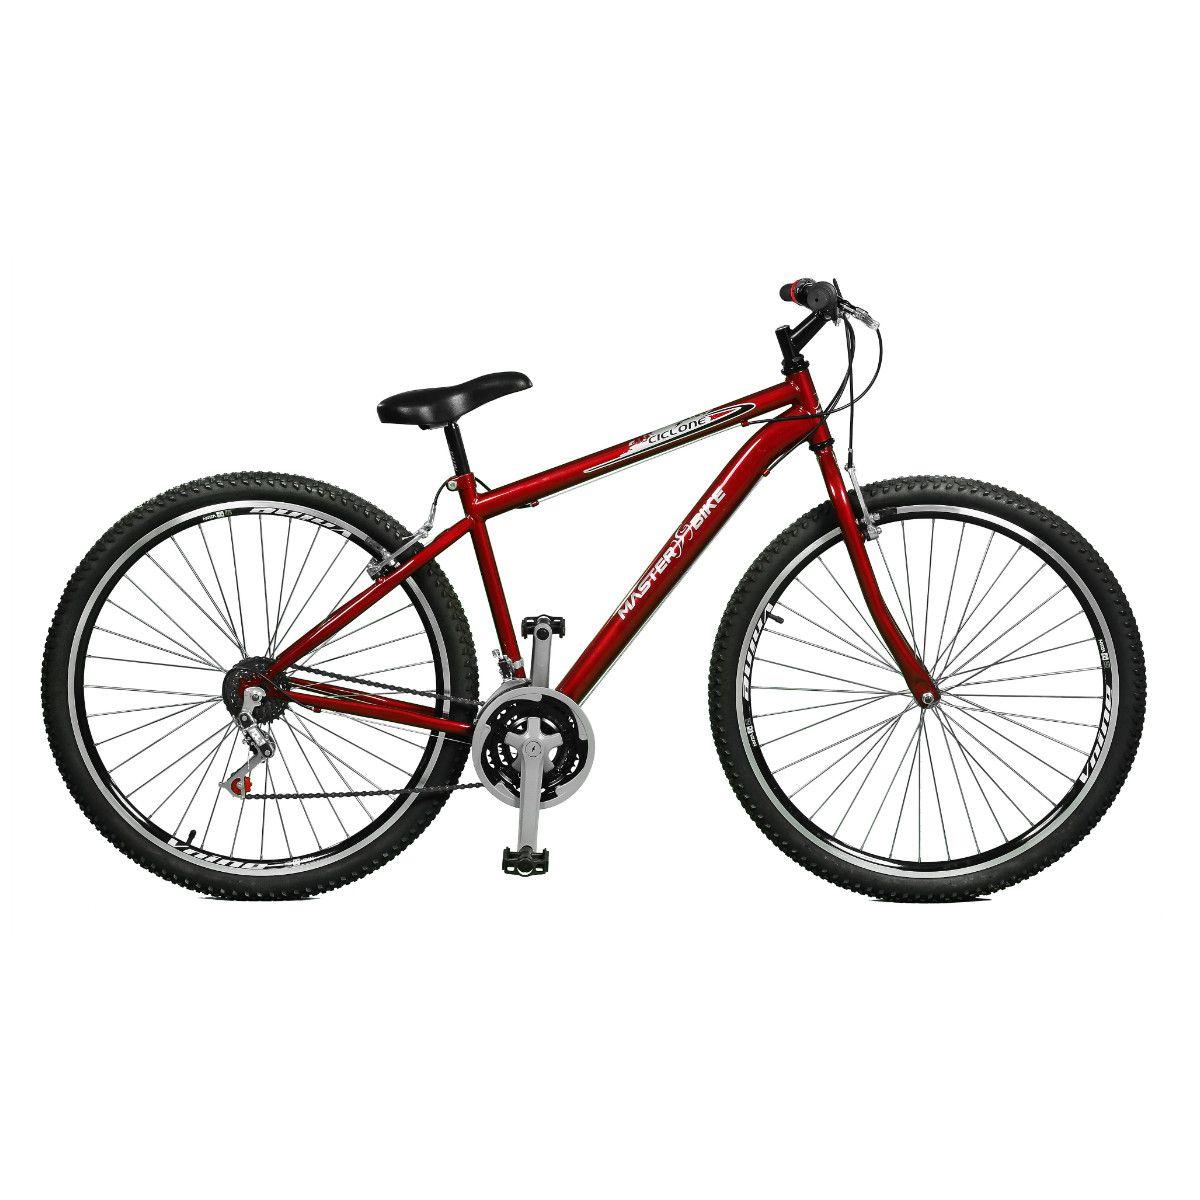 Bicicleta Master Bike Aro 29 Ciclone 21 Marchas V-Brake Vermelho